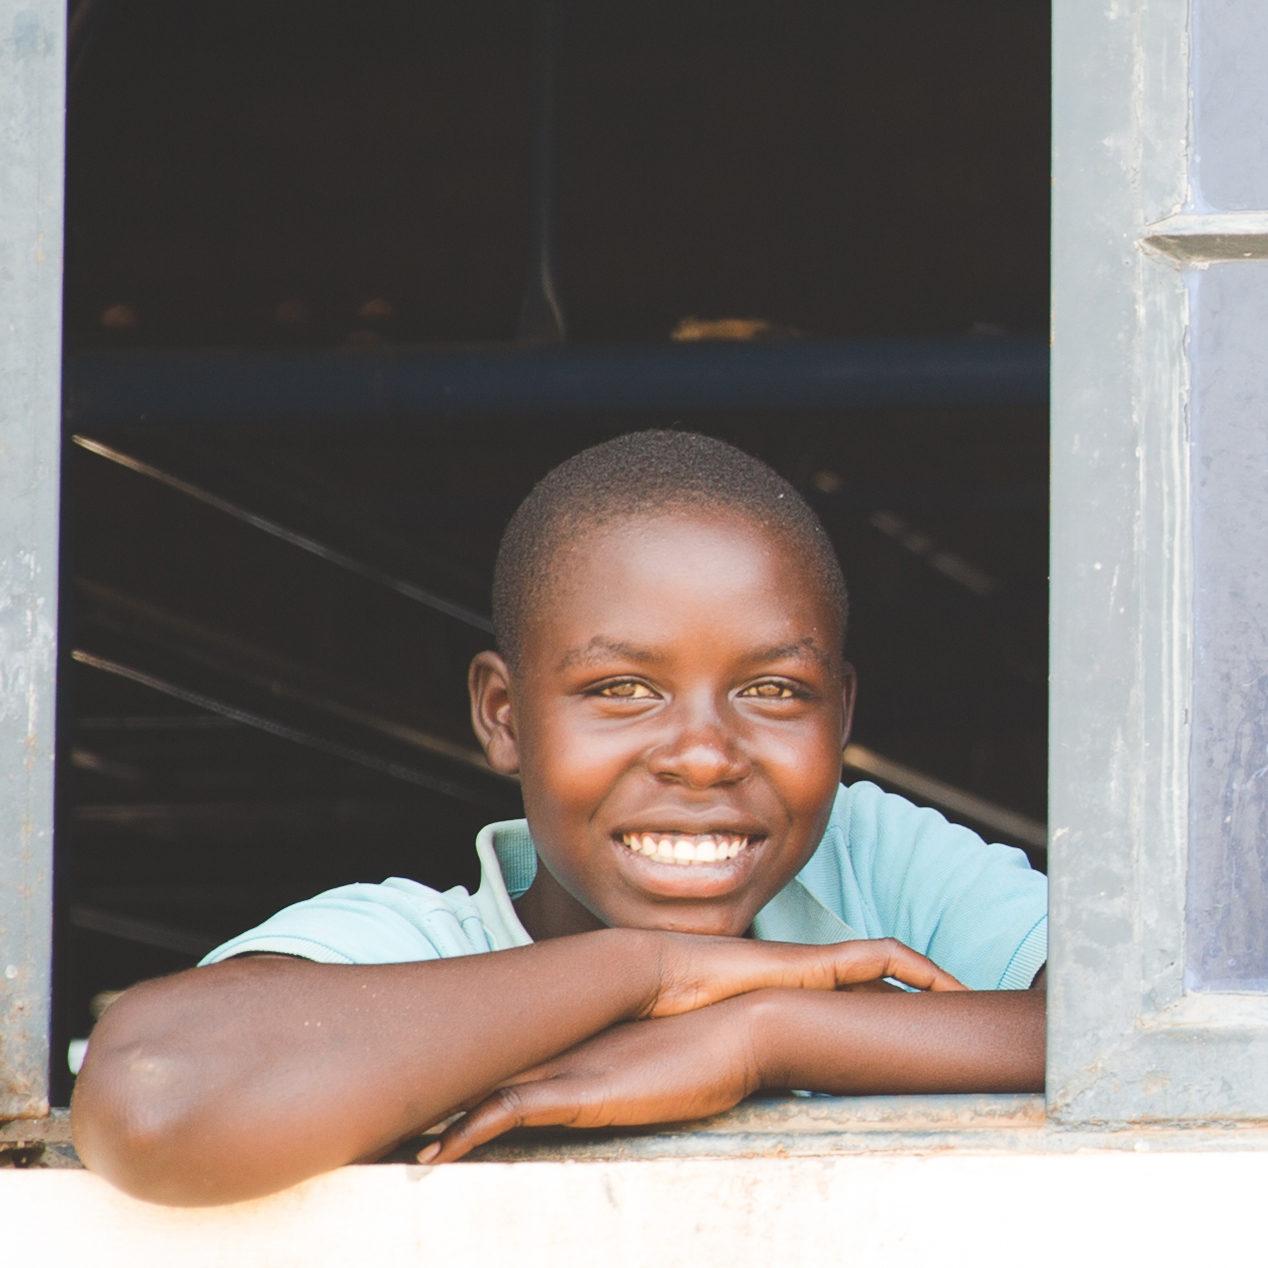 Uganda school children